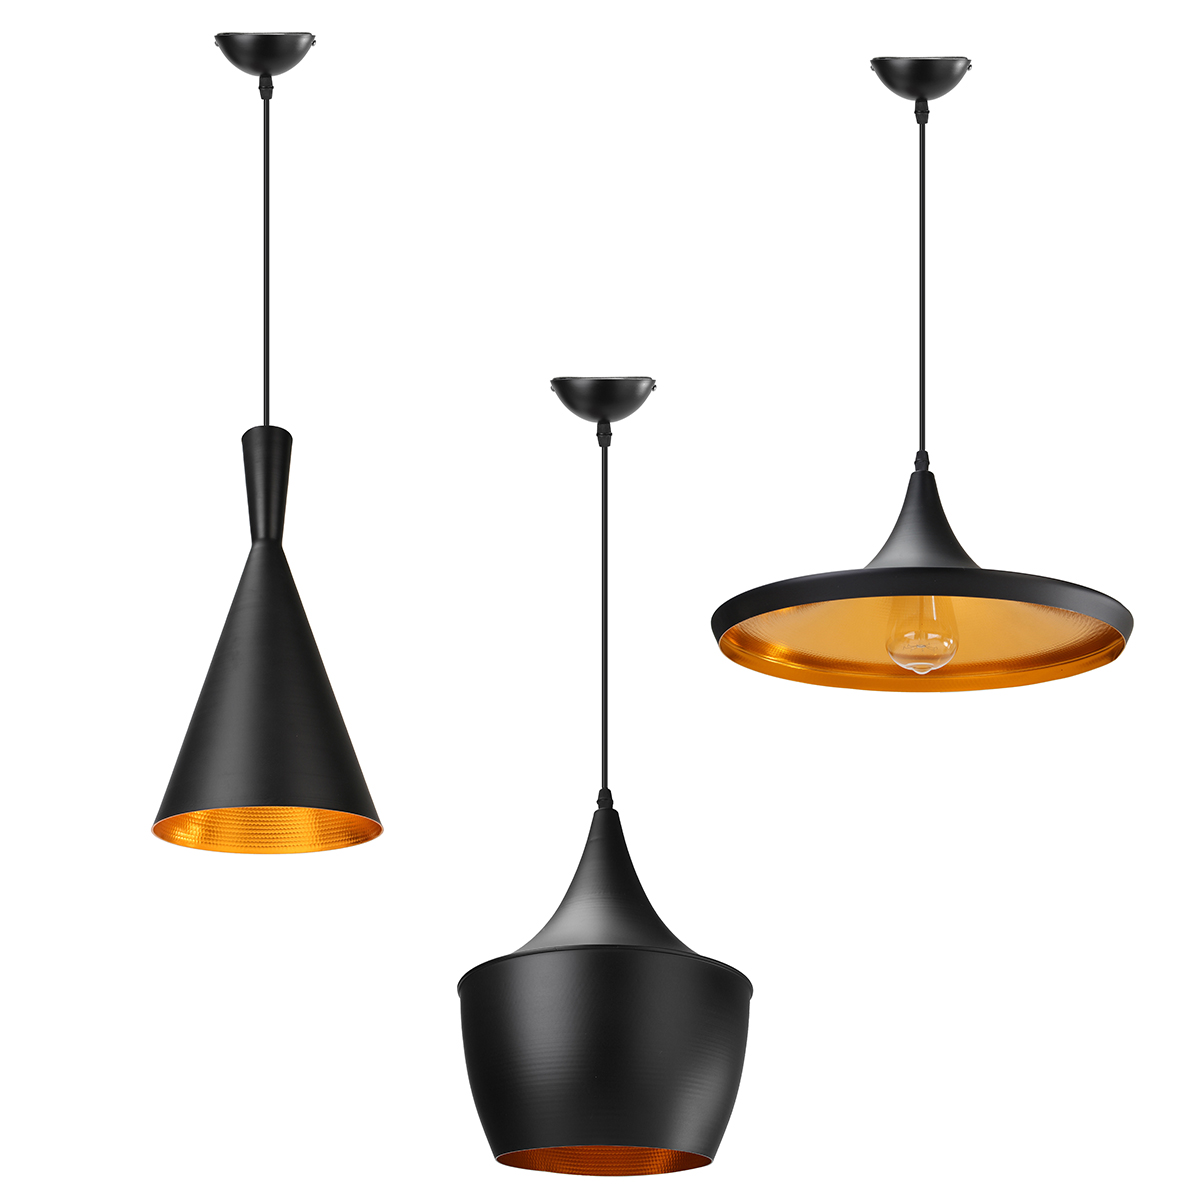 3 Style Vintage Retro Horn Shape Light Hanging Single Chandelier Lamp Creatives Lighting Restaurant Bar Bedrooms Hanging Lamps